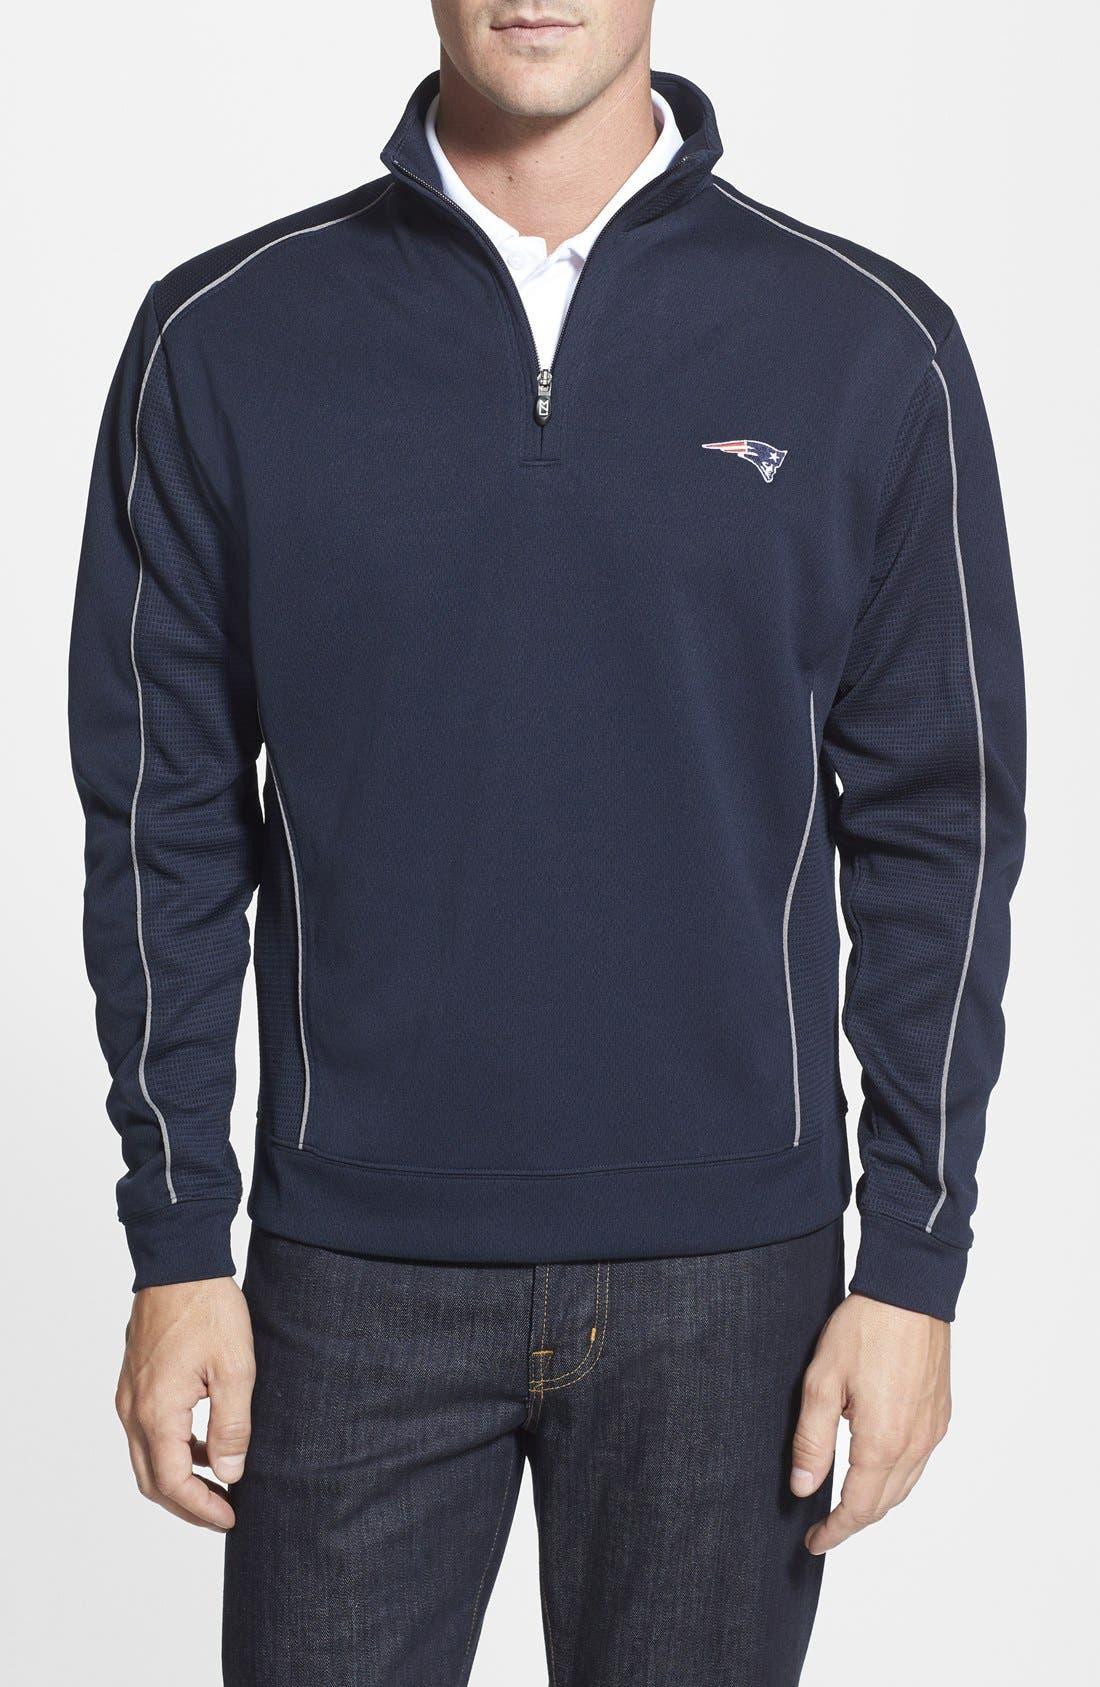 New England Patriots - Edge DryTec Moisture Wicking Half Zip Pullover,                         Main,                         color, Navy Blue